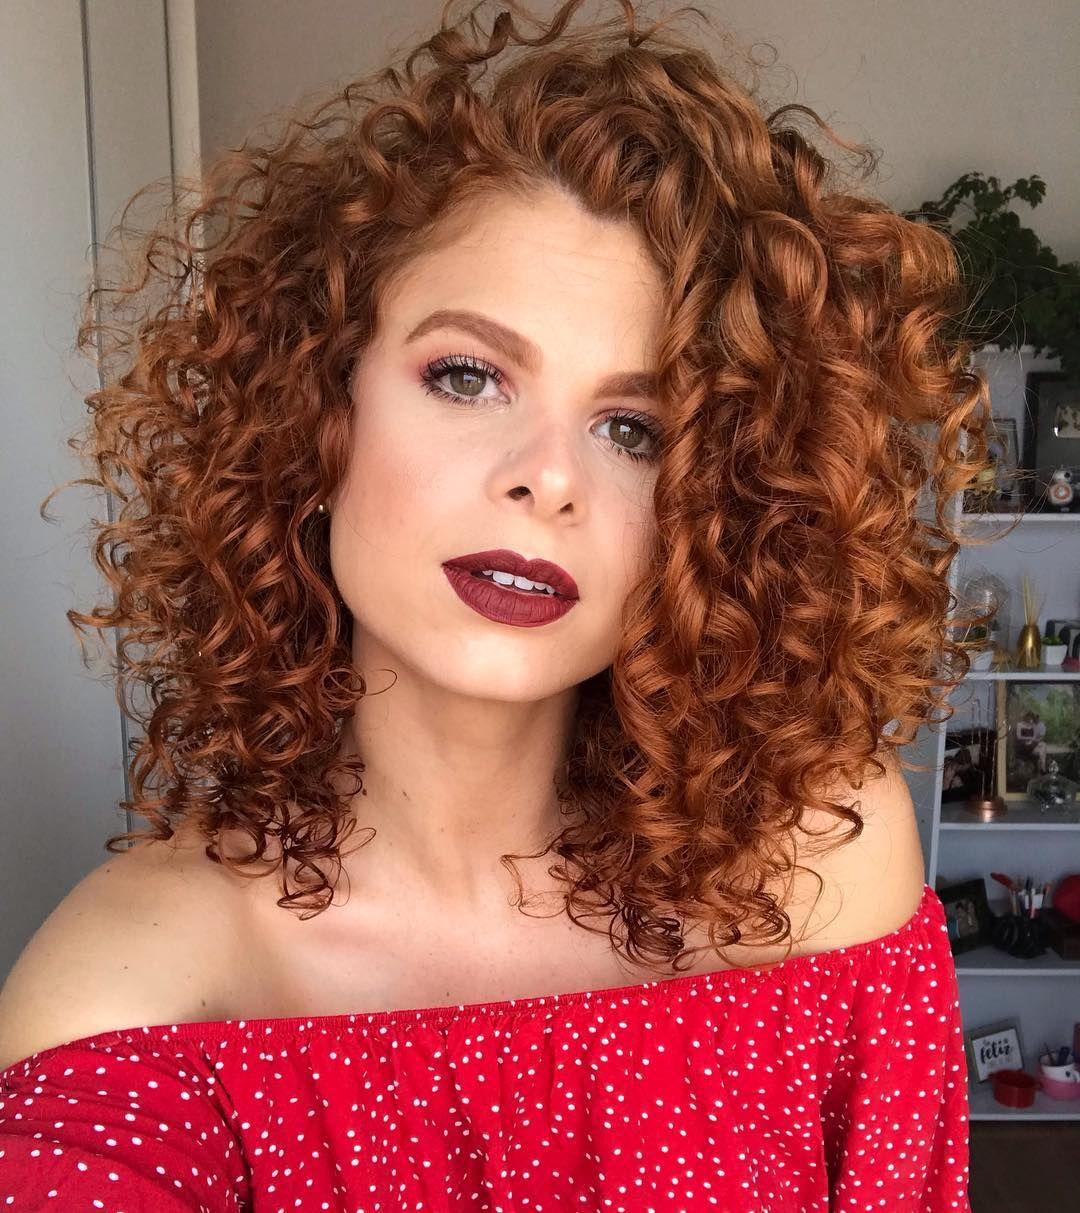 40 fotos de cabelo médio repicado para inspirar sua mudança de visual |  Cabelo repicado medio, Cabelo cacheado ruivo, Cabelo médio feminino